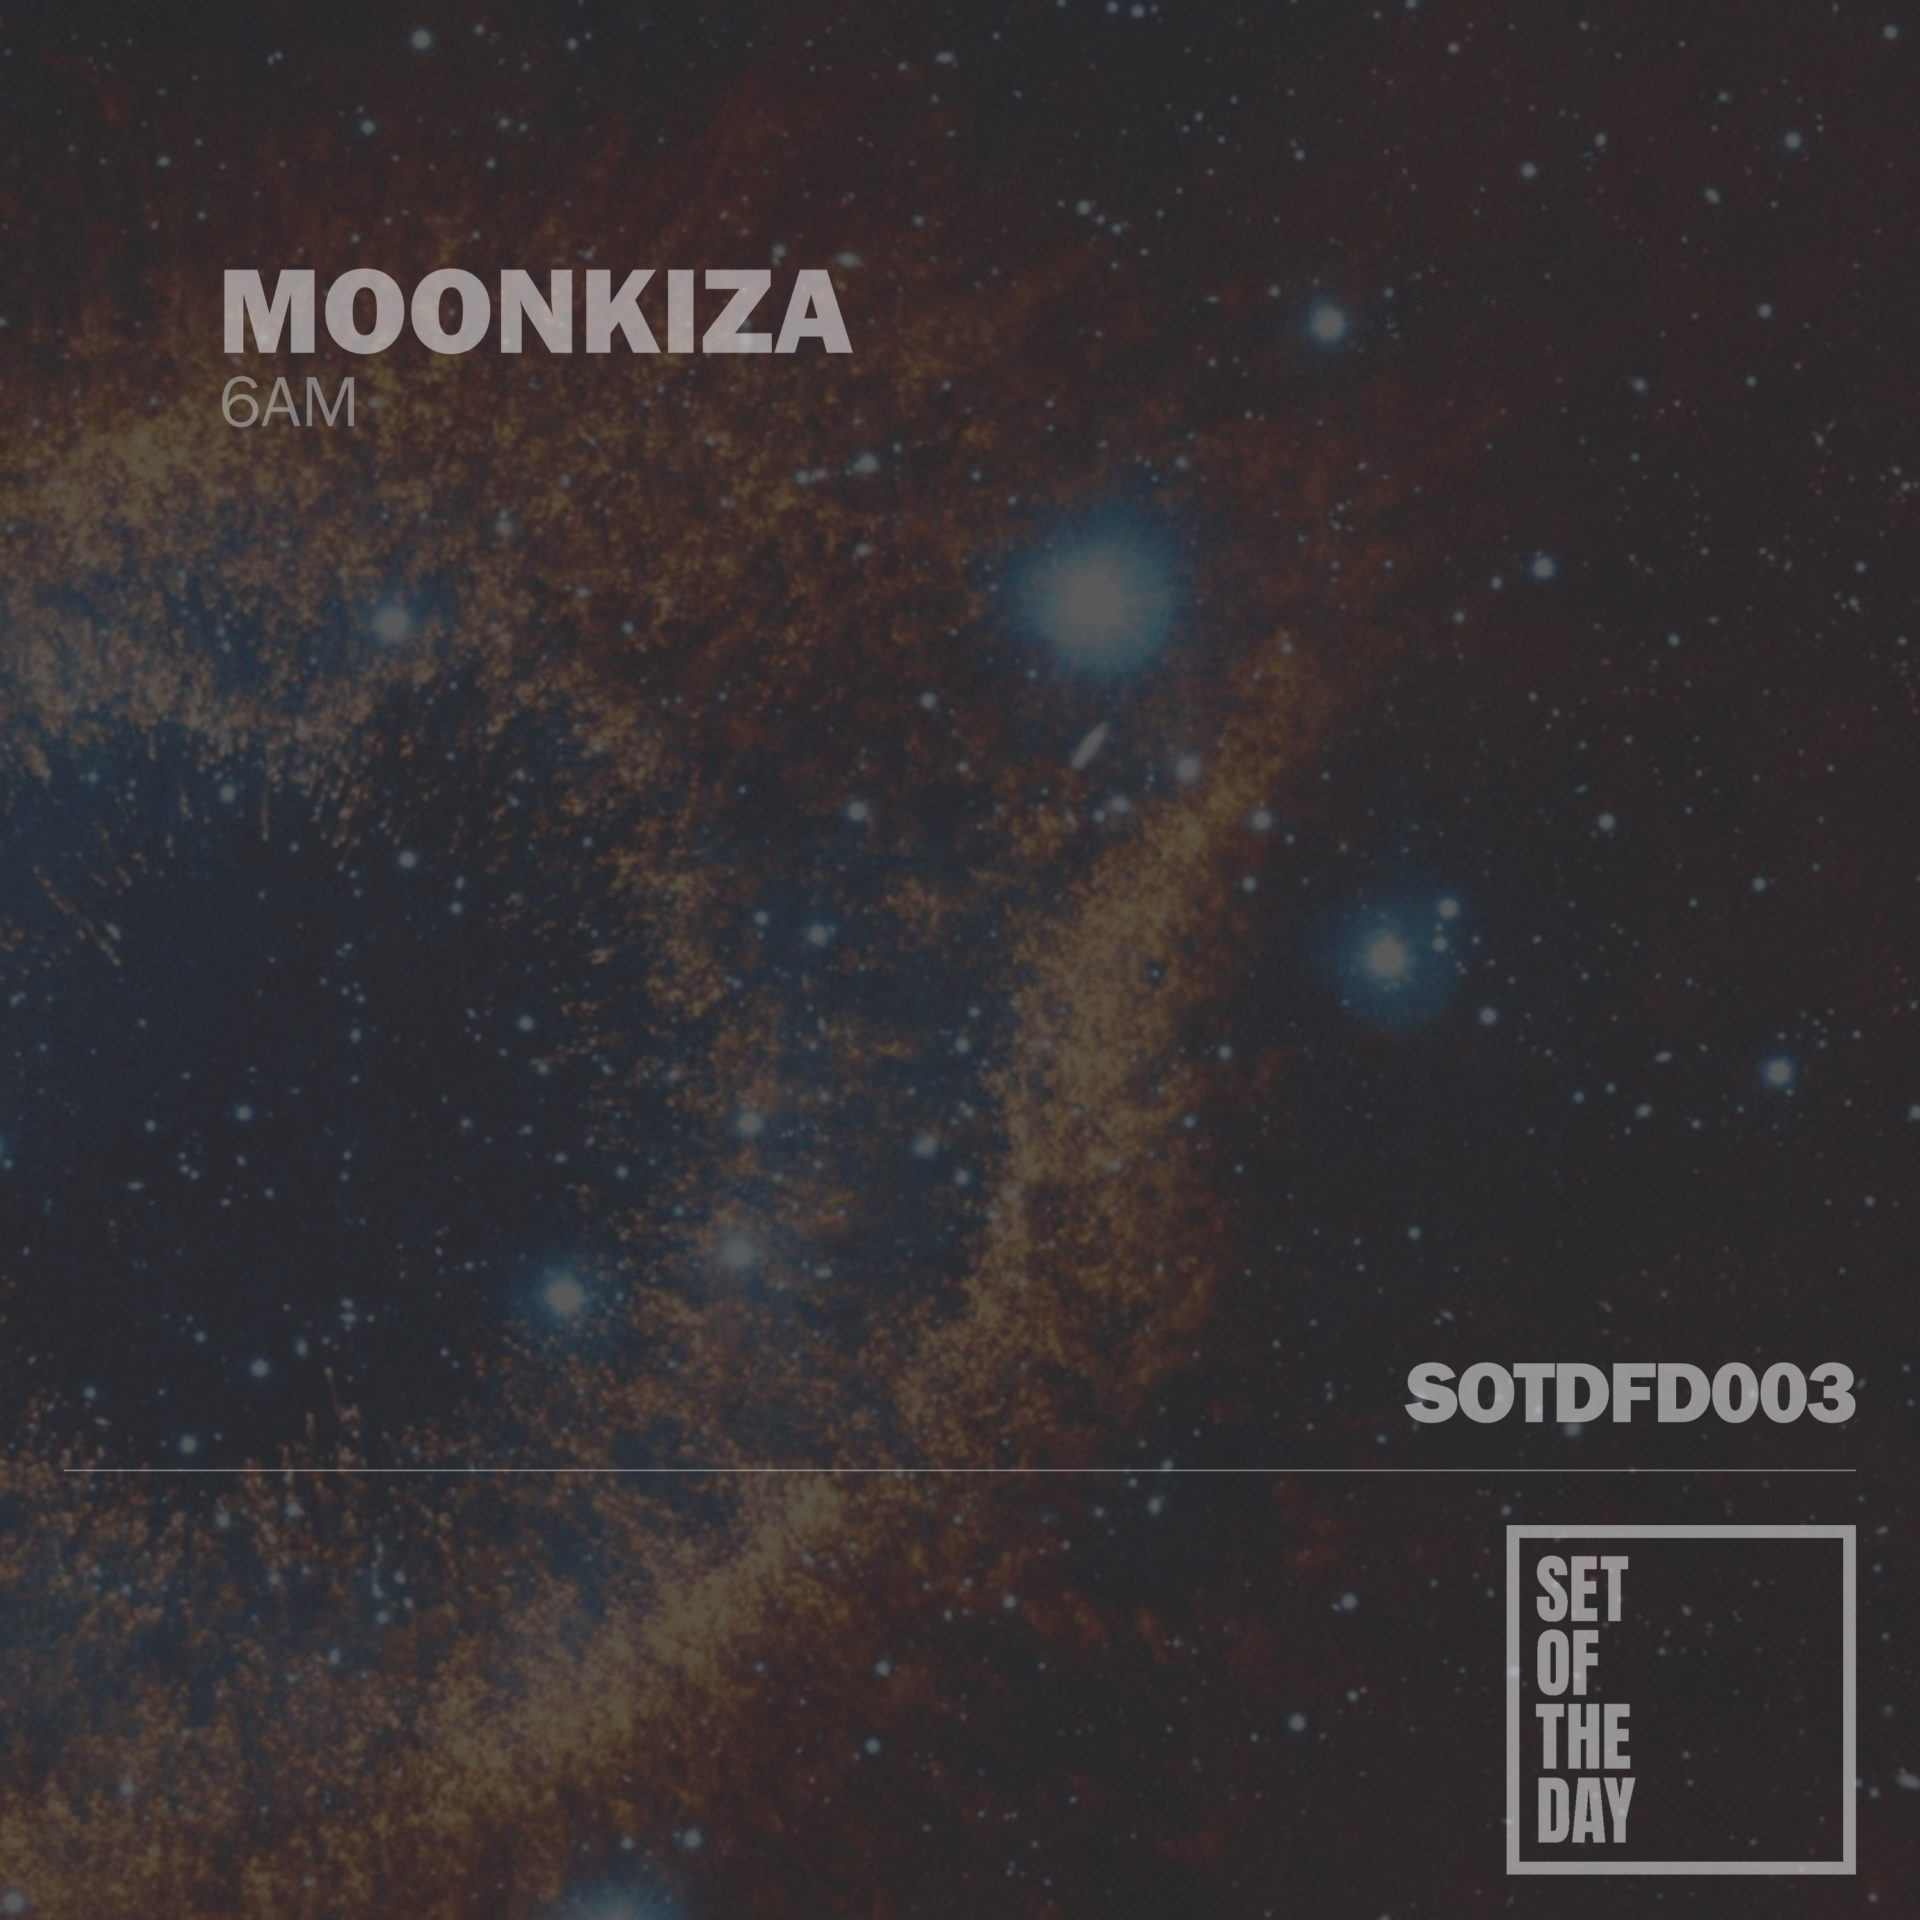 sotdfd003-moonkiza-6am-1920x1920 - Releases